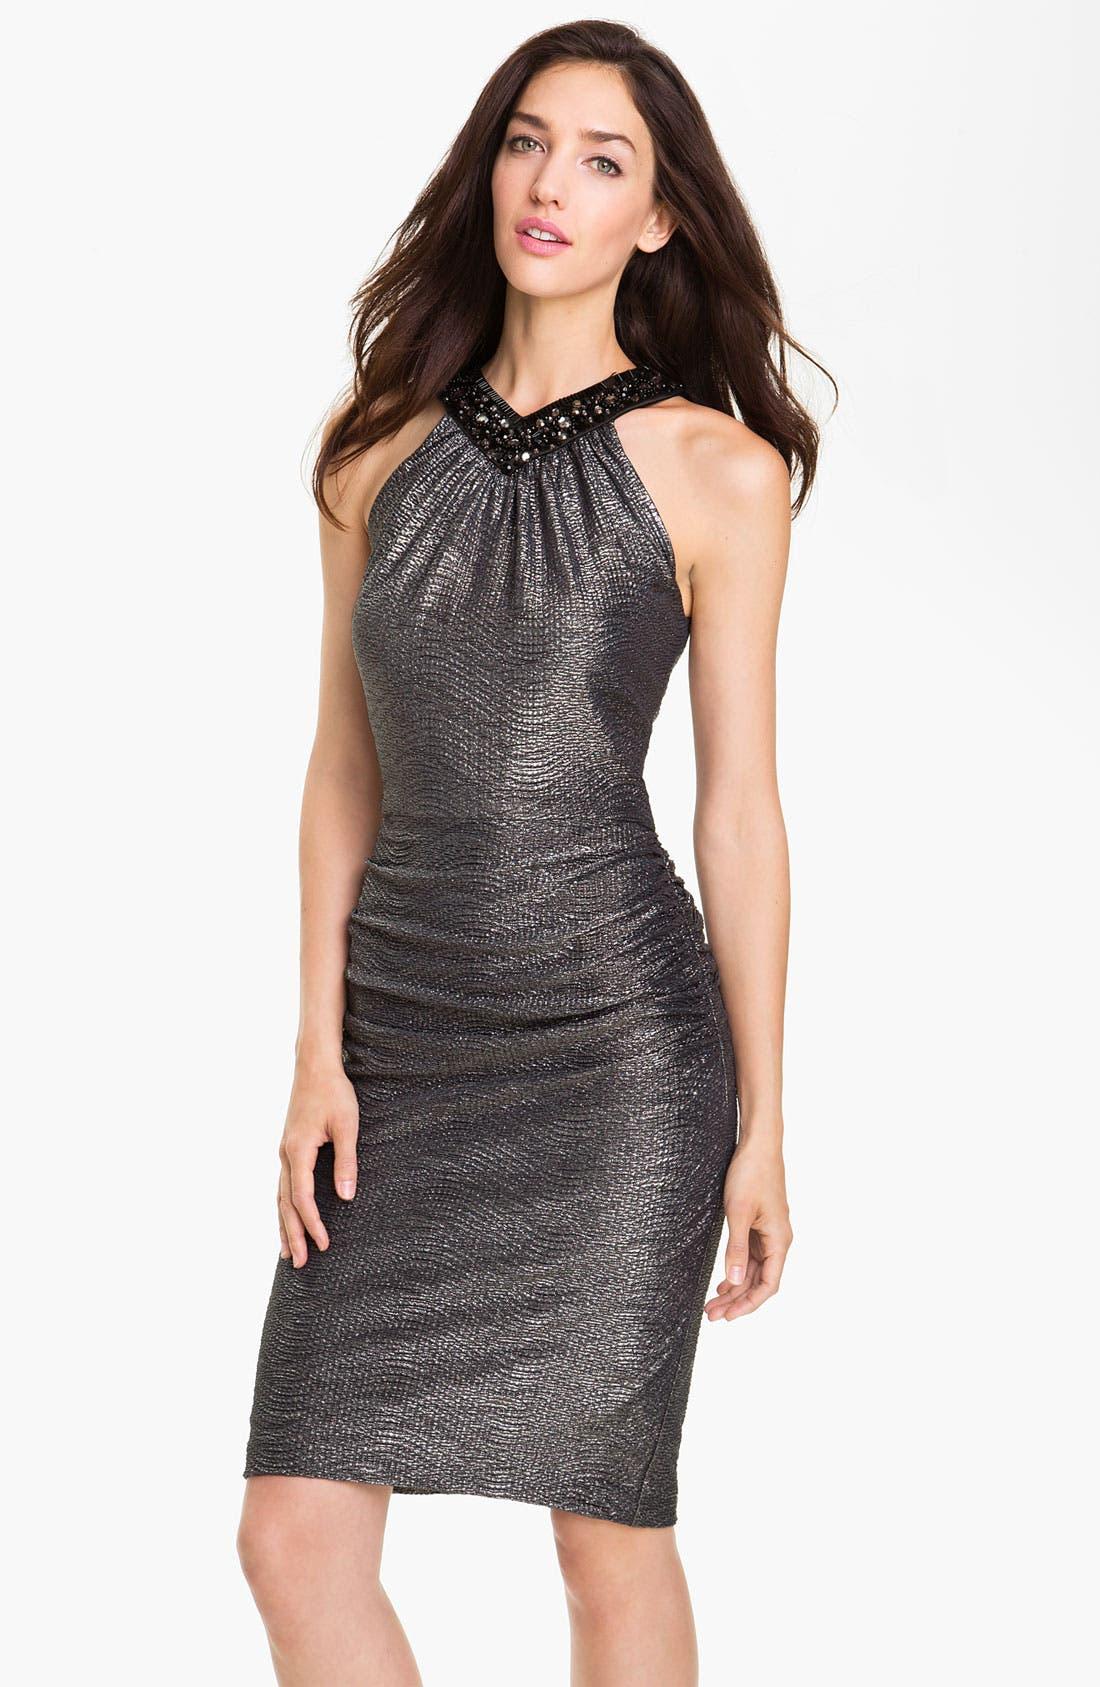 Alternate Image 1 Selected - Maggy London Beaded Neck Metallic Sheath Dress (Petite)